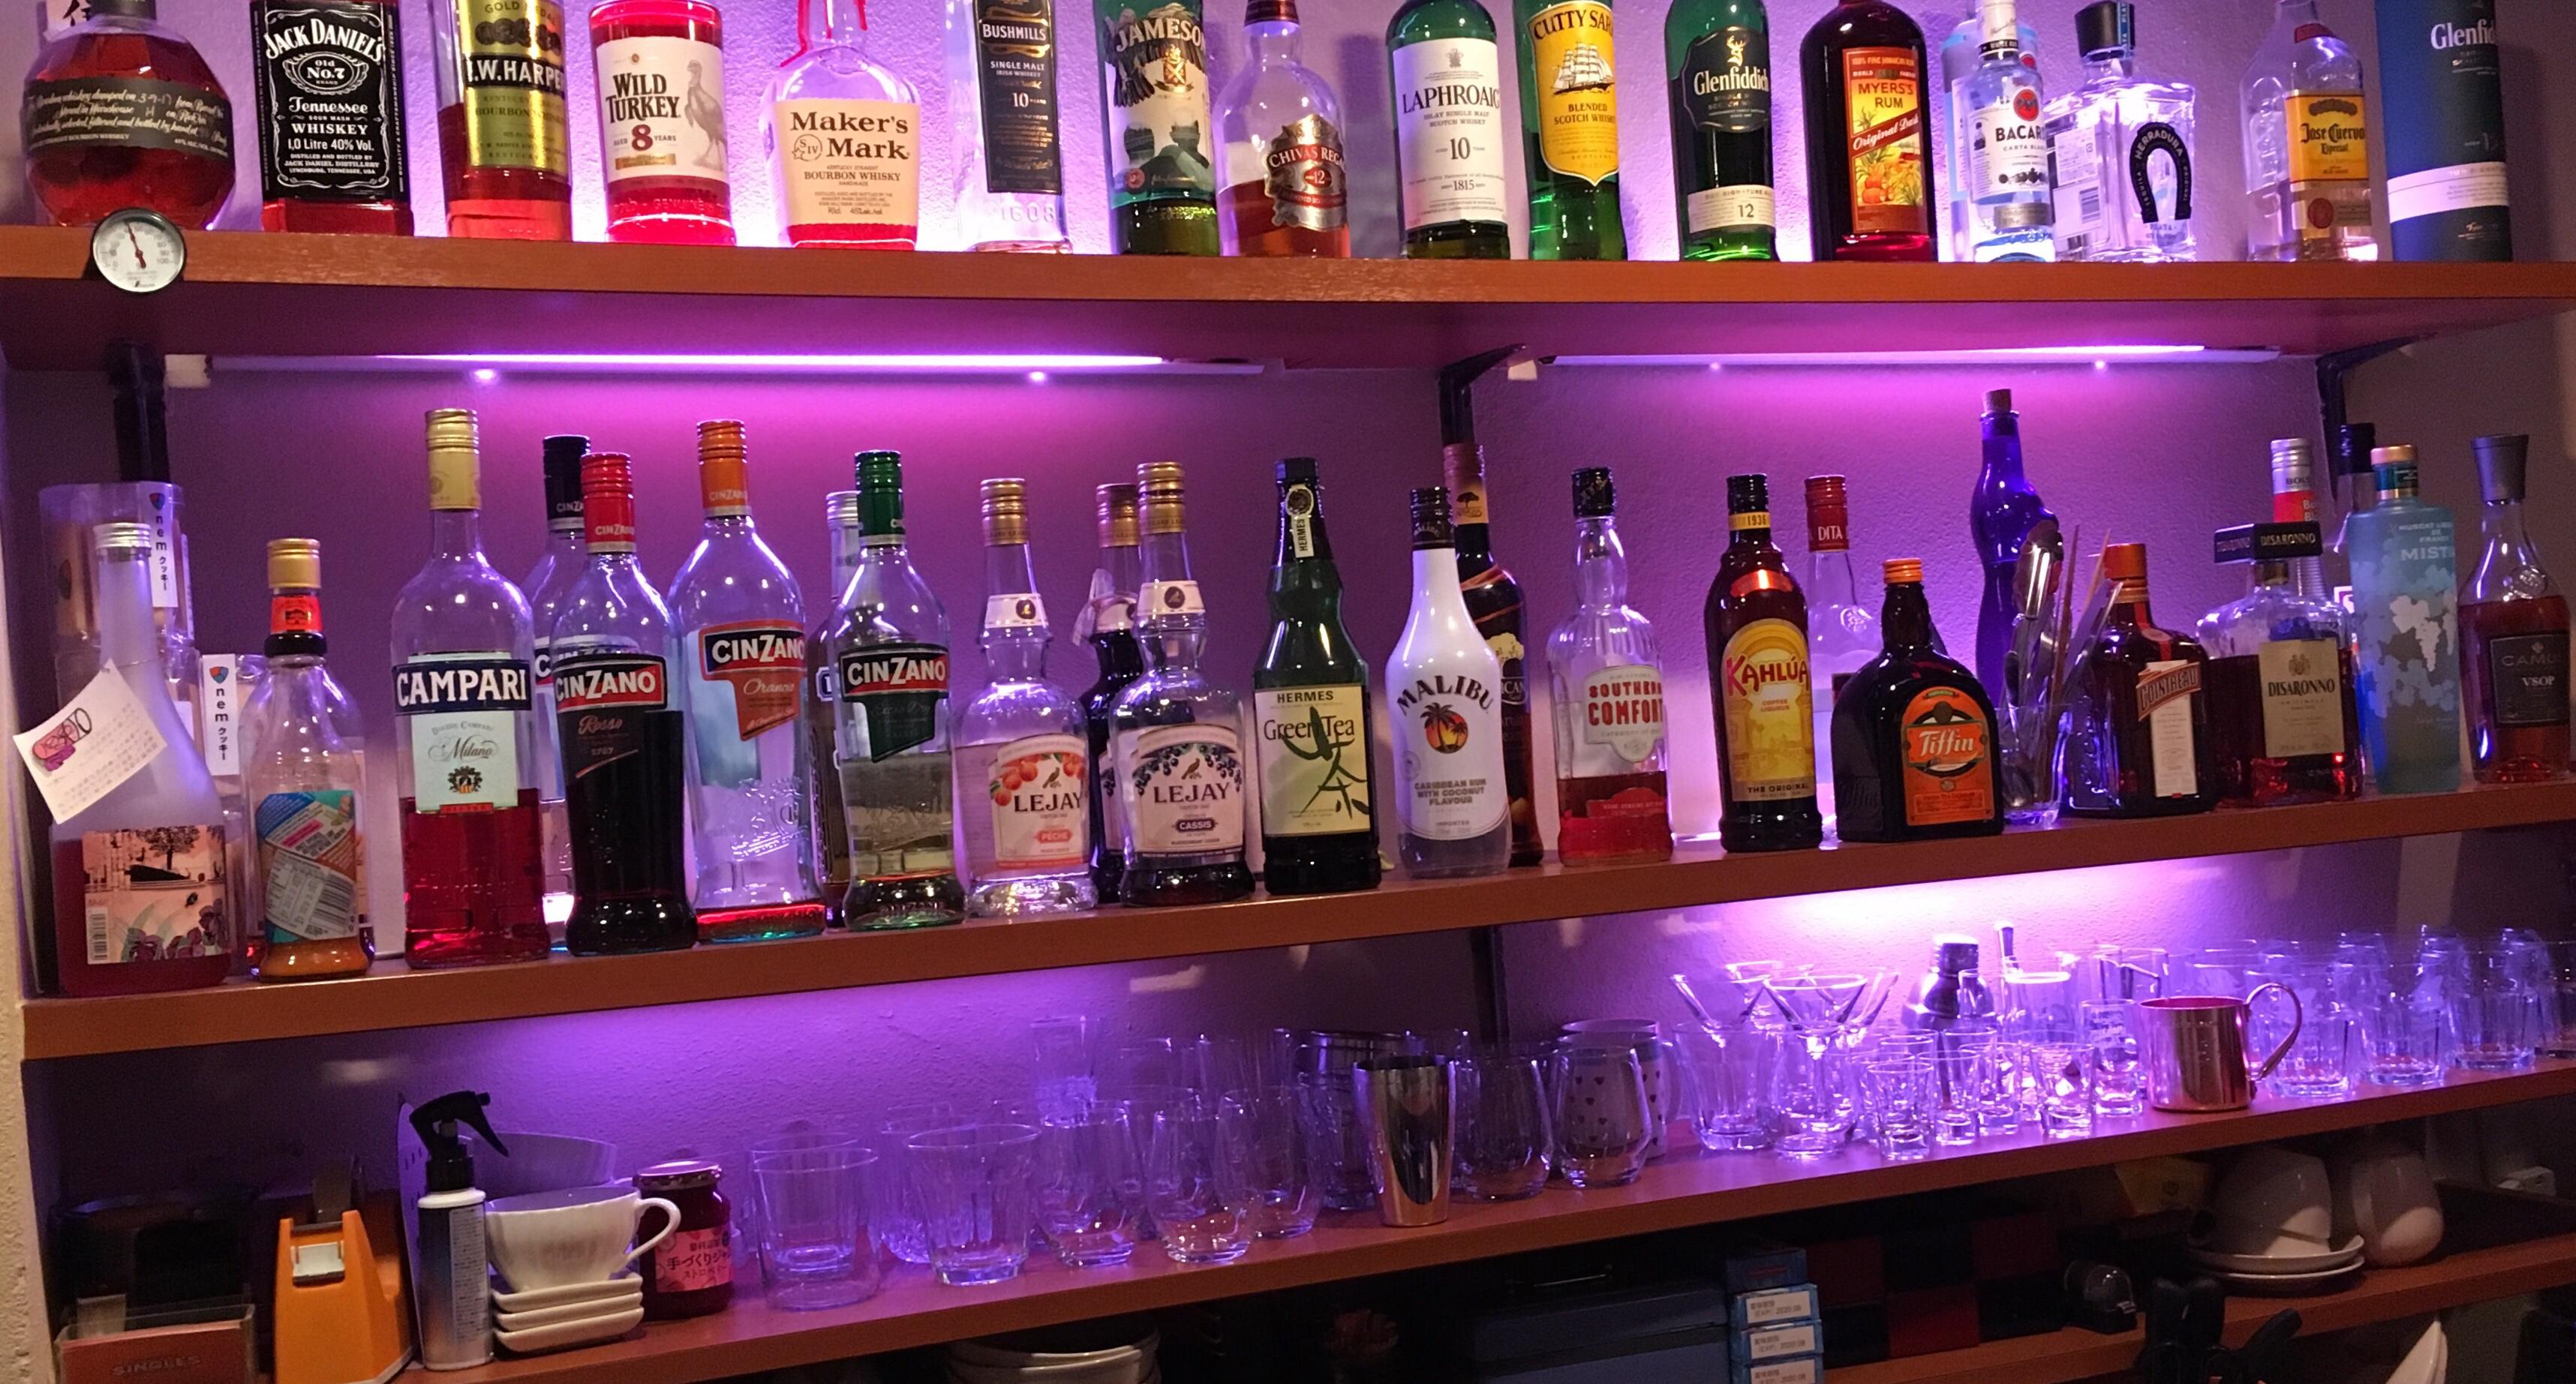 Bar SINGLESの場所ってどこだよ?(道案内篇)